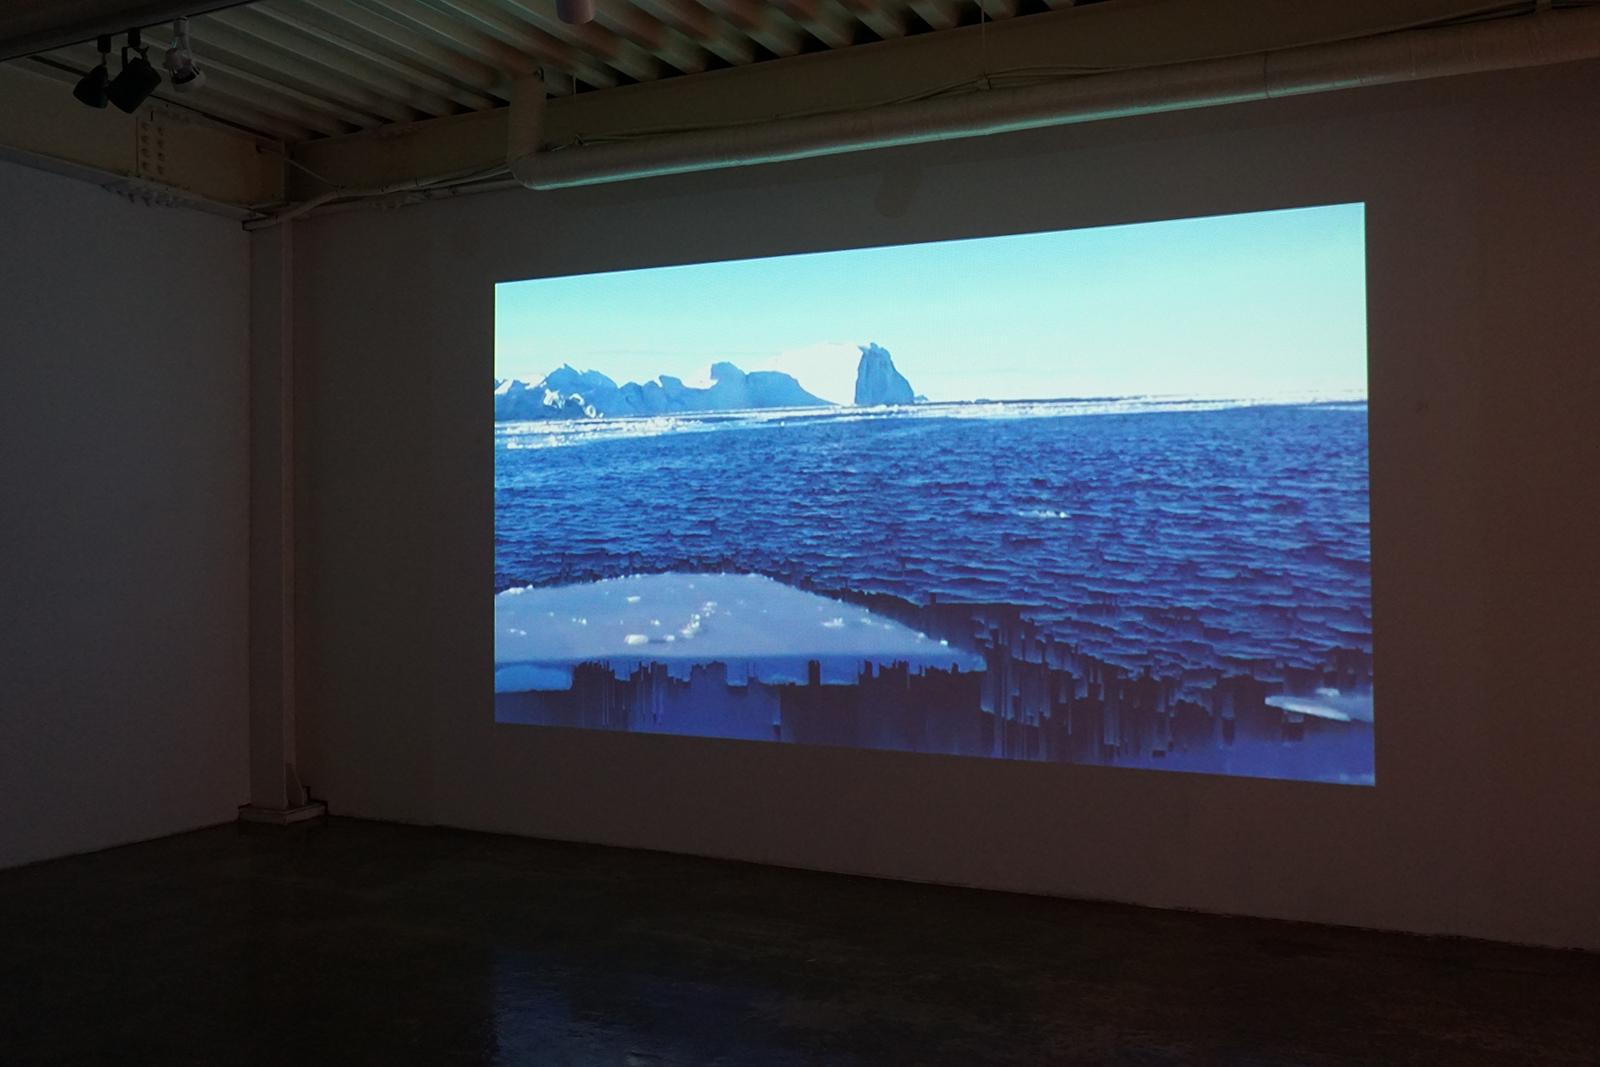 The End of the World as we know it foto fra CICA Experimental Film and Video 2020 udstillingen